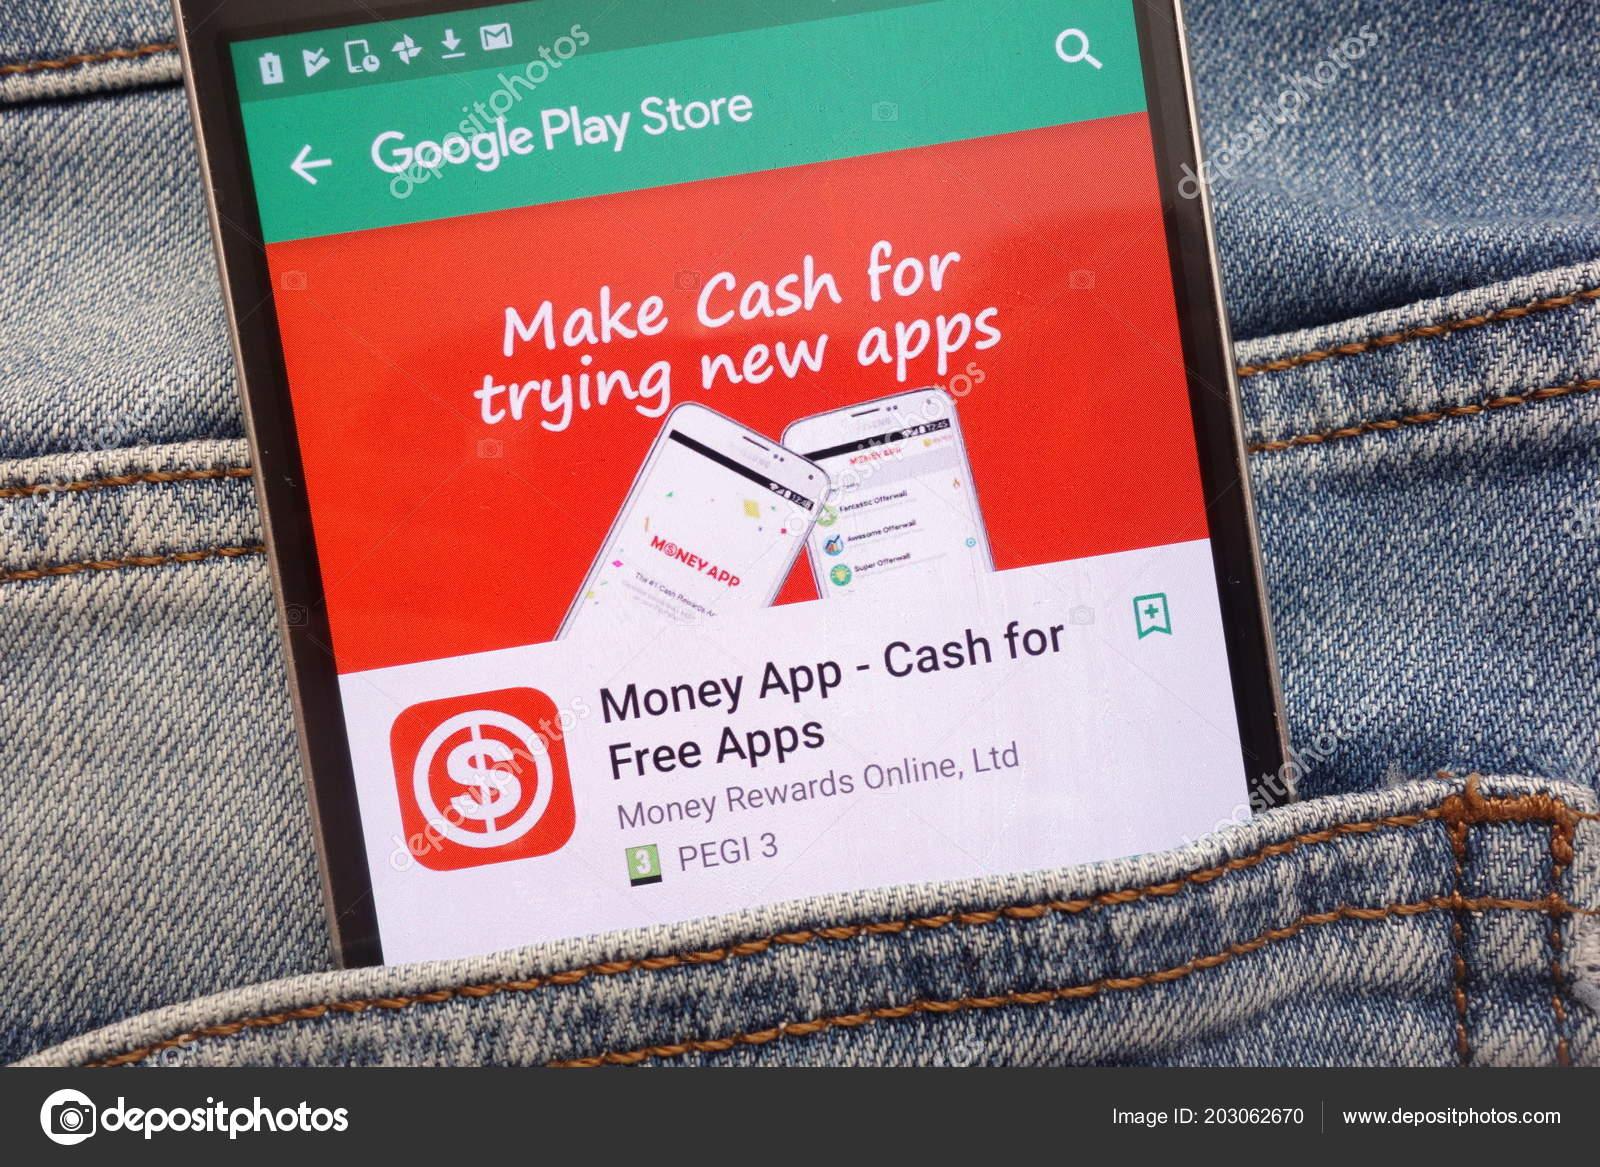 konskie poland june 2018 money app cash free apps google stock